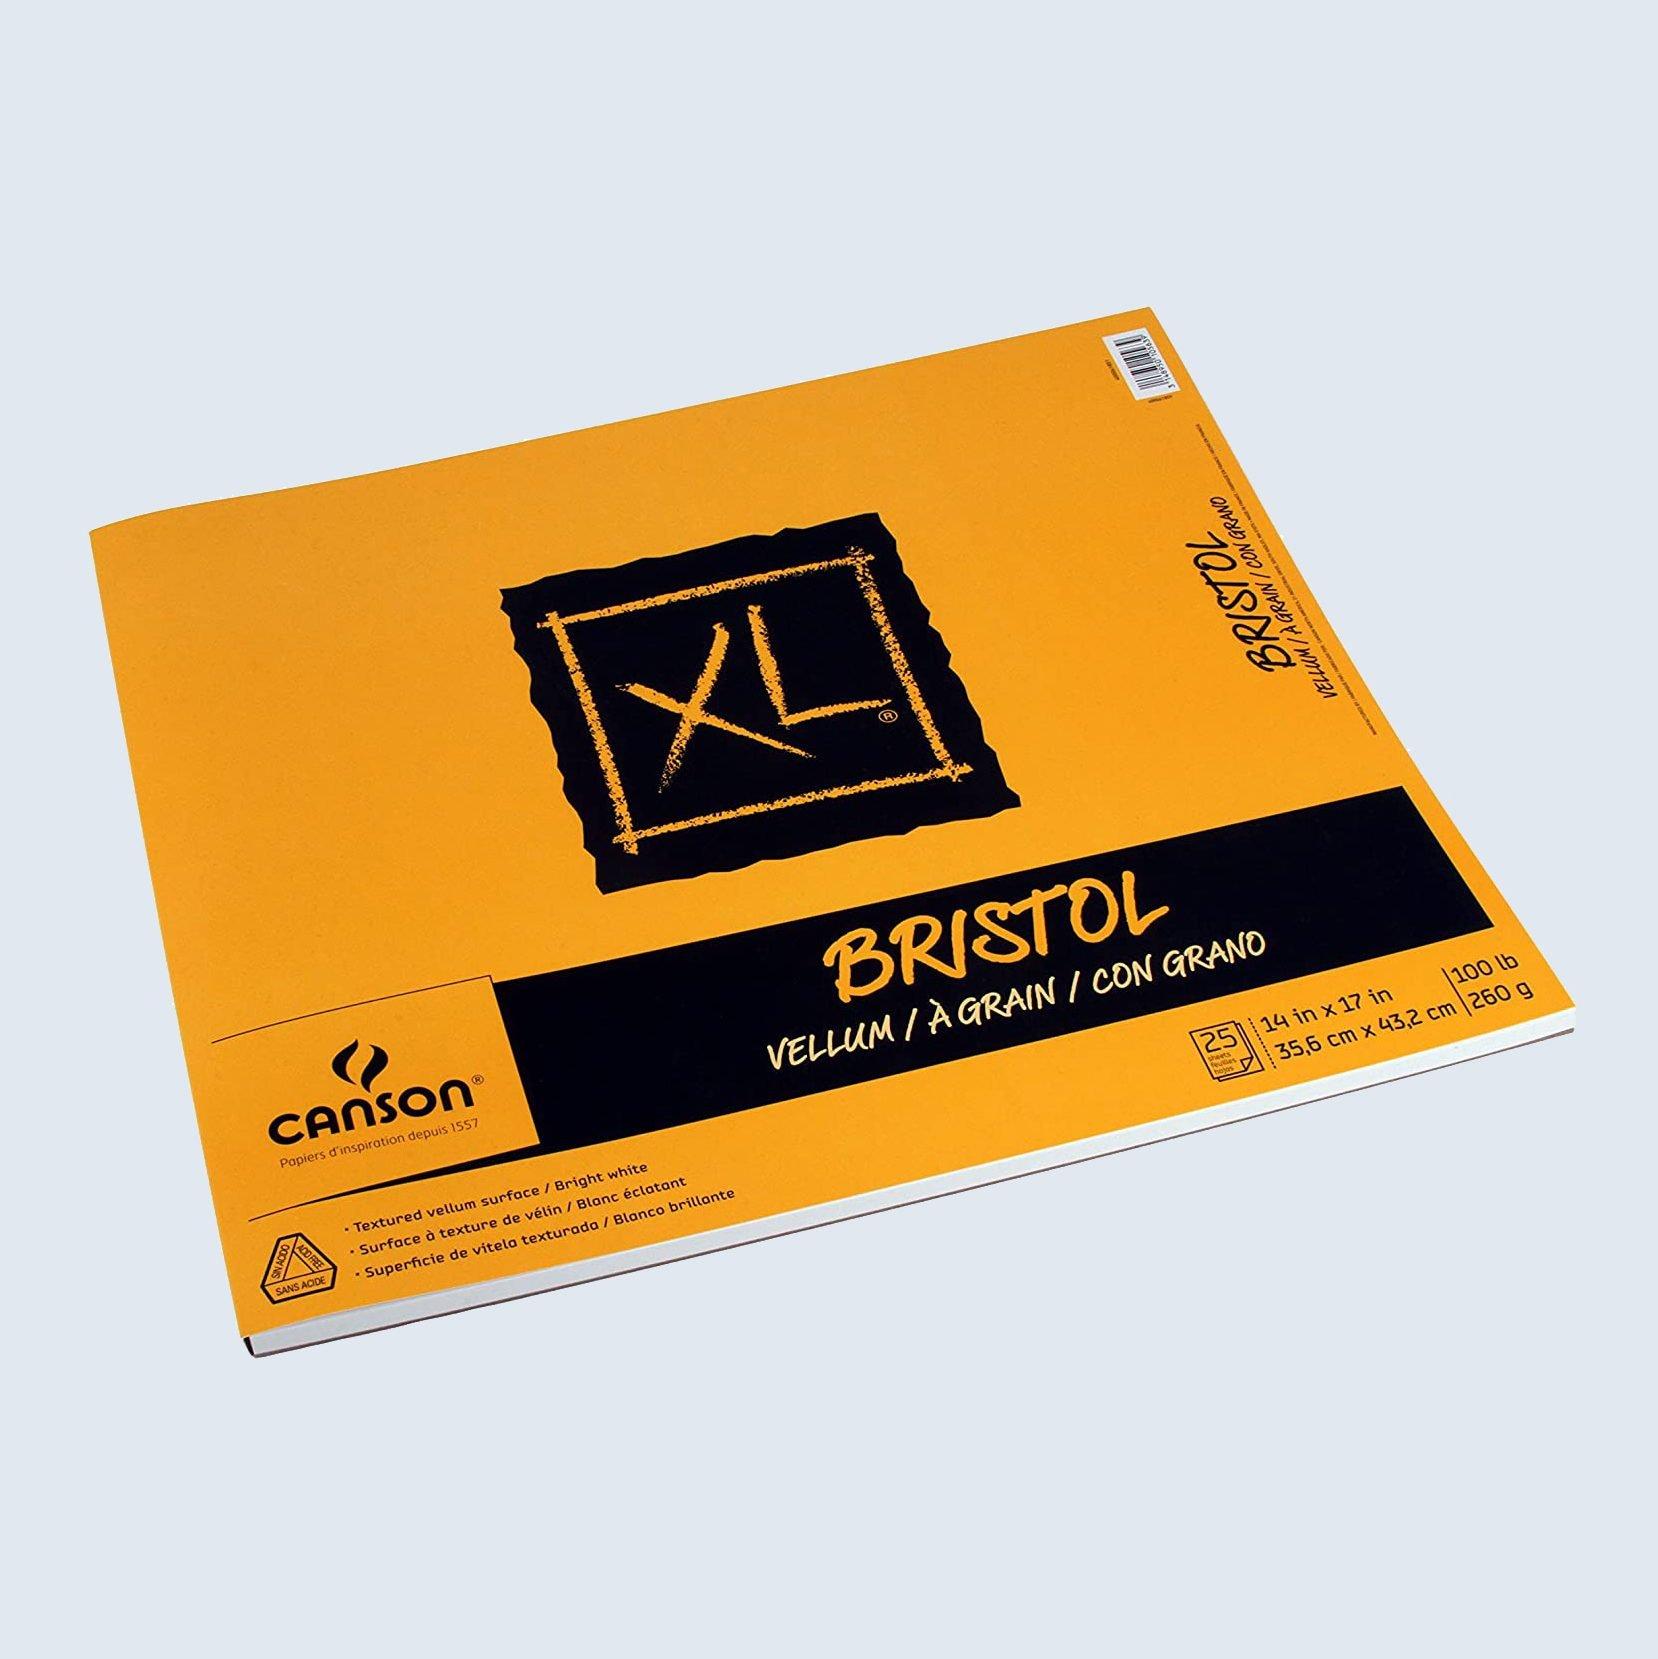 Canson XL Bristol paper pad